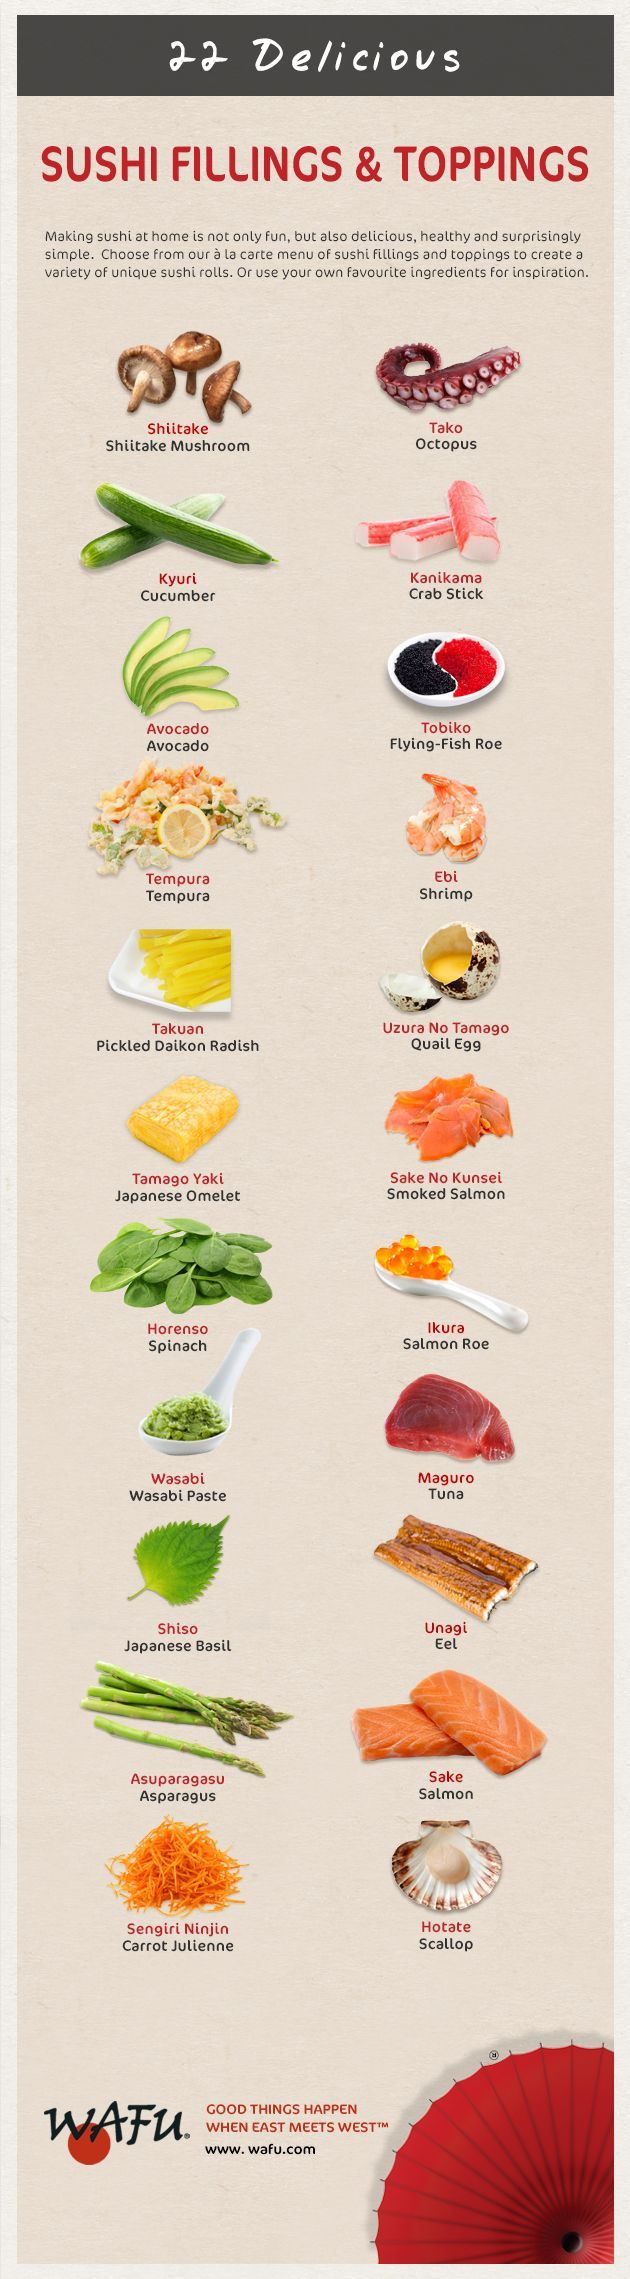 sushi-ingredients-infographic